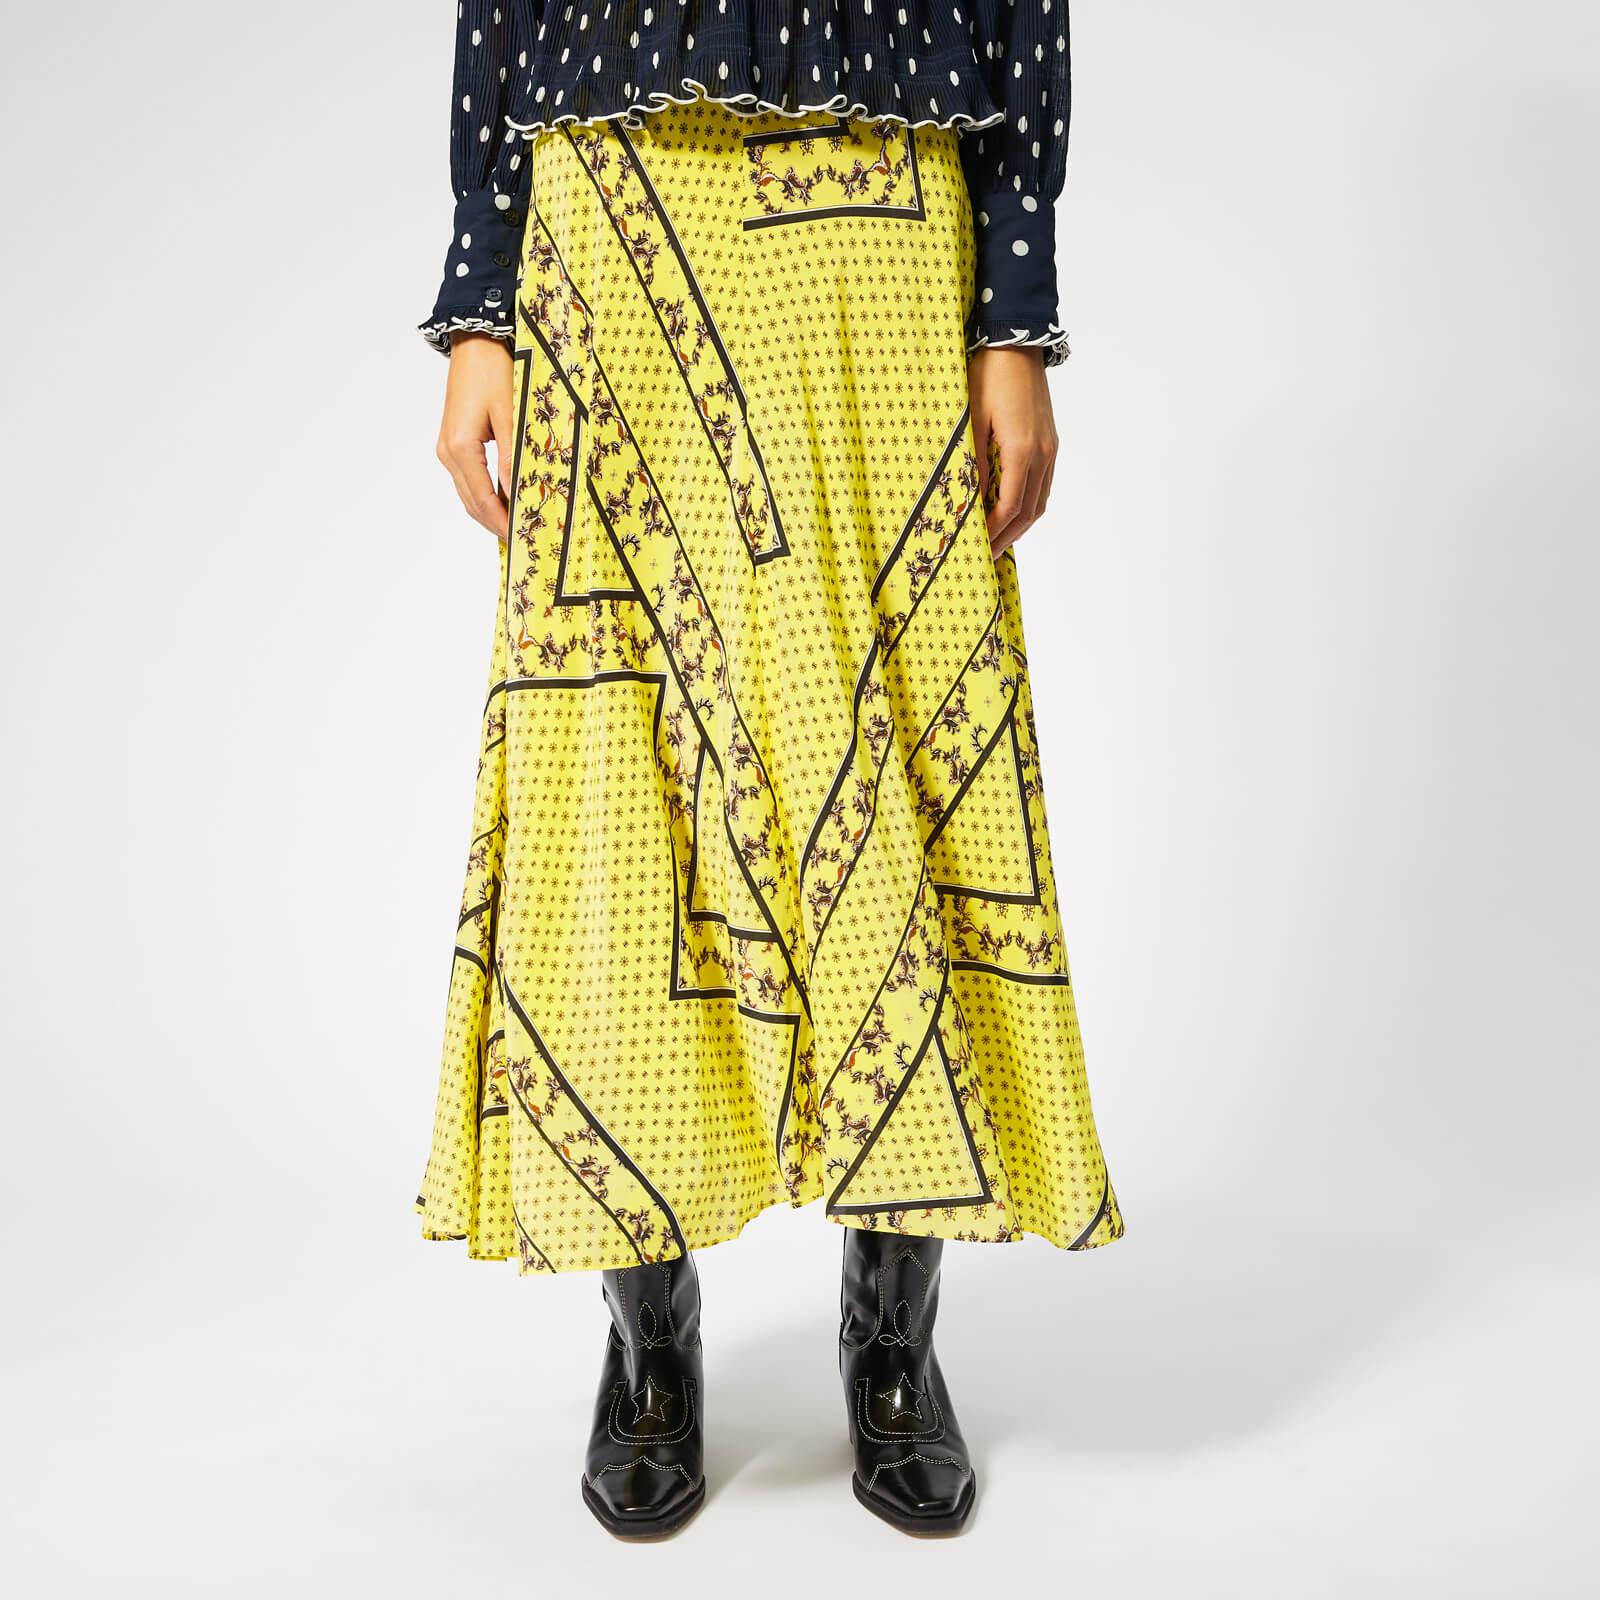 640d53639 Ganni Women's Hemlock Silk Skirt - Minion Yellow - Free UK Delivery over £50